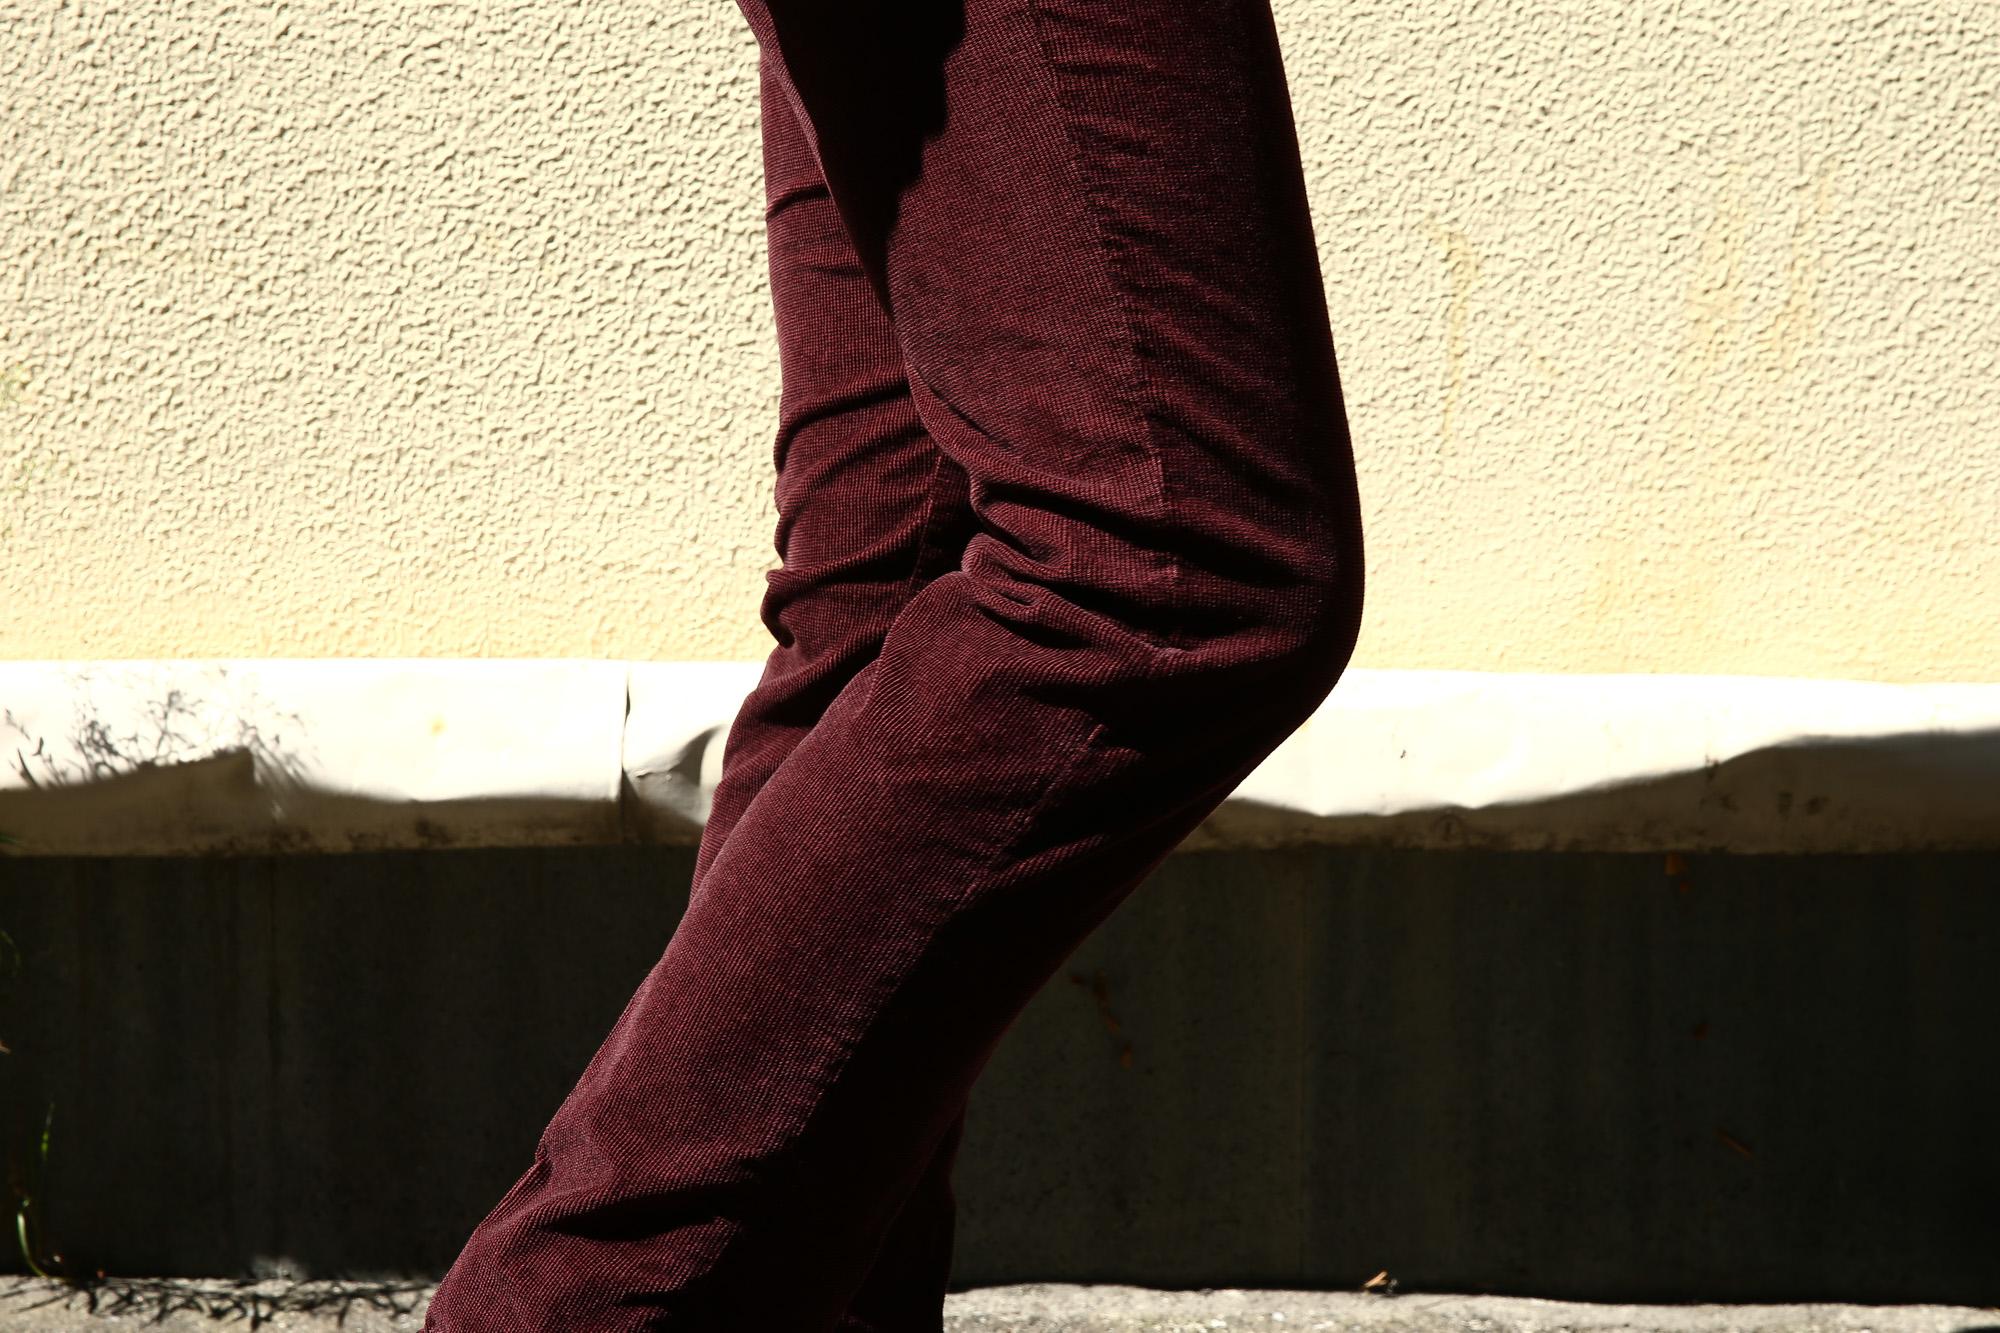 INCOTEX SLACKS(インコテックススラックス) 1ST603 SLIM FIT Garment Dyed Stretch Waffle スリムフィット ガーメントダイ ストレッチ ワッフルコーデュロイ パンツ BORDEAUX (ボルドー・226) 2016 秋冬新作 愛知 名古屋 インコテックス 27 28 29 30 31 32 33